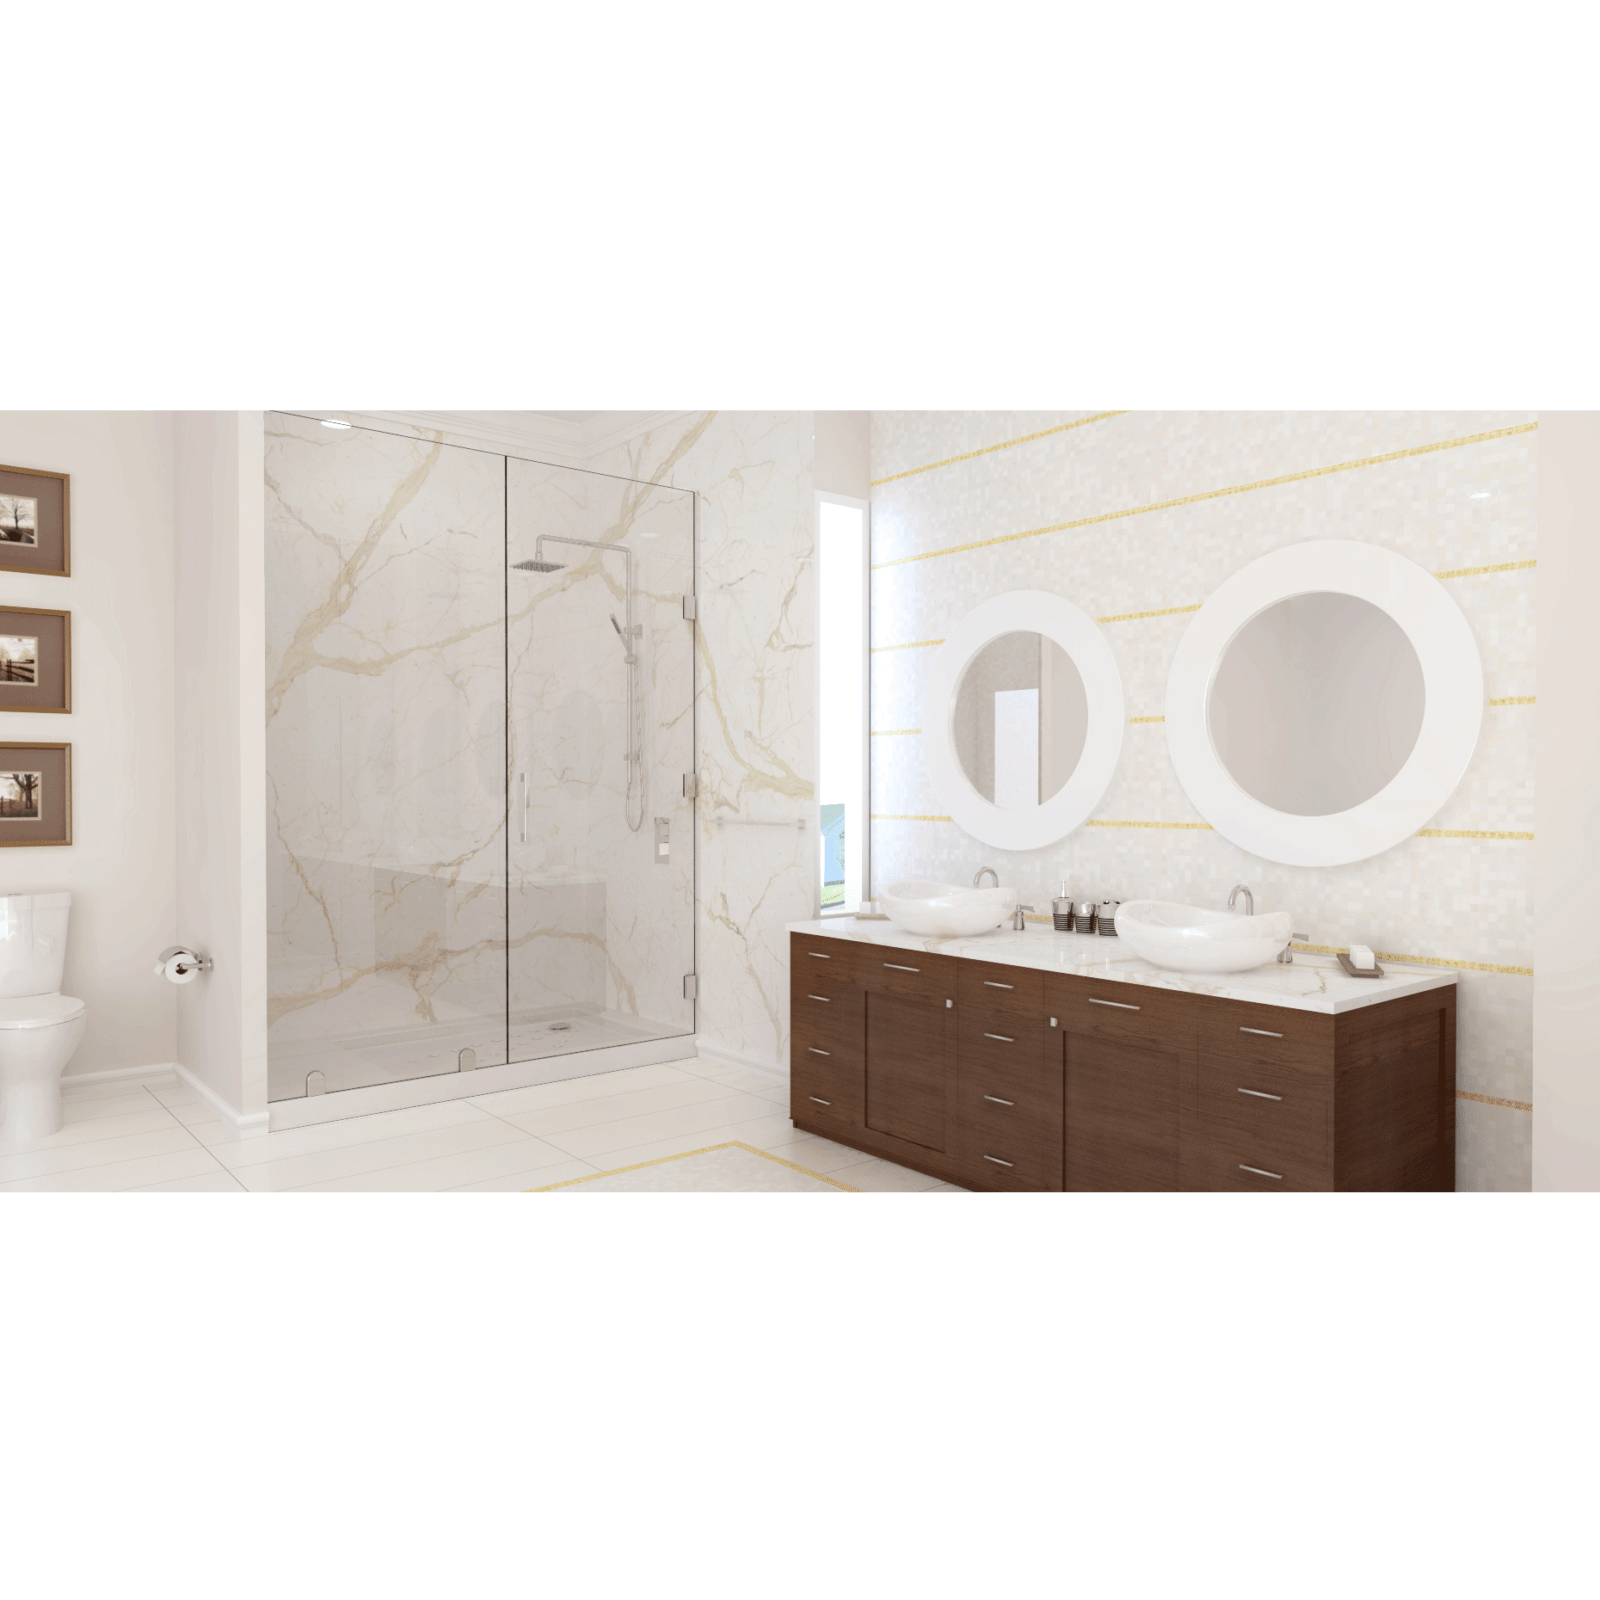 Calacatta Engineered Stone and Trend Mix Bliss Mosaic